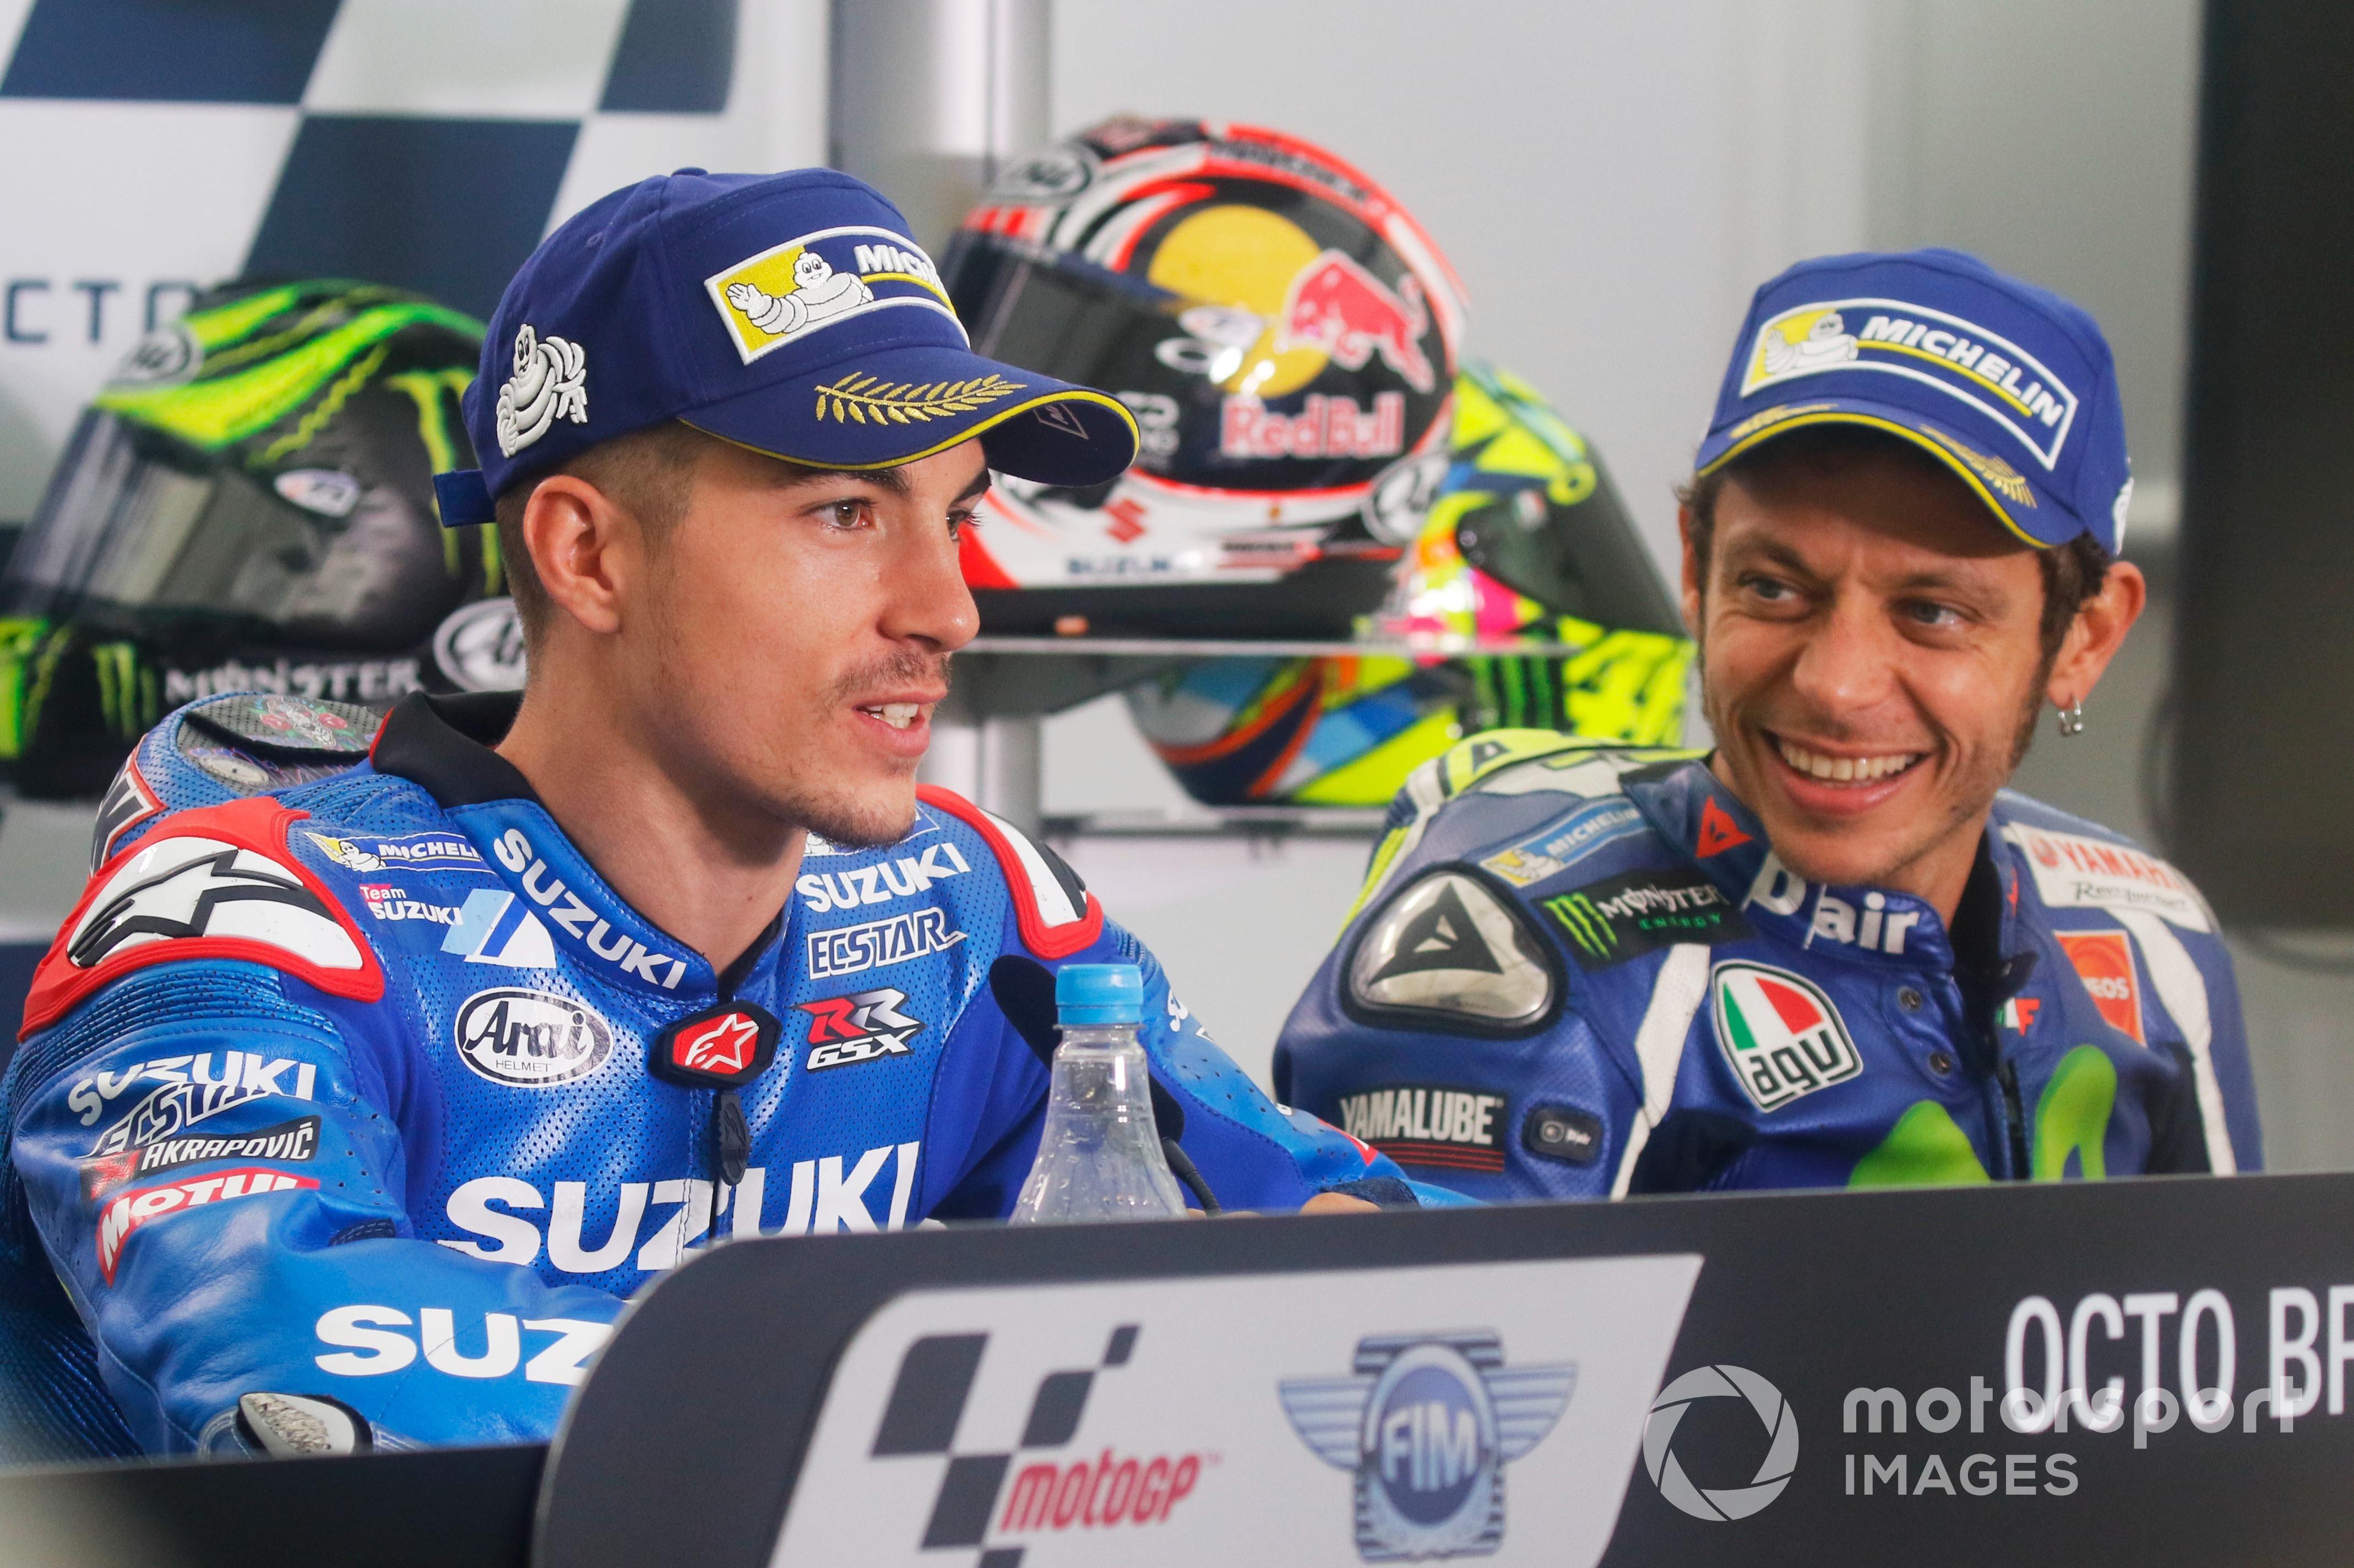 Maverick Vinales and Valentino Rossi at the 2016 British MotoGP